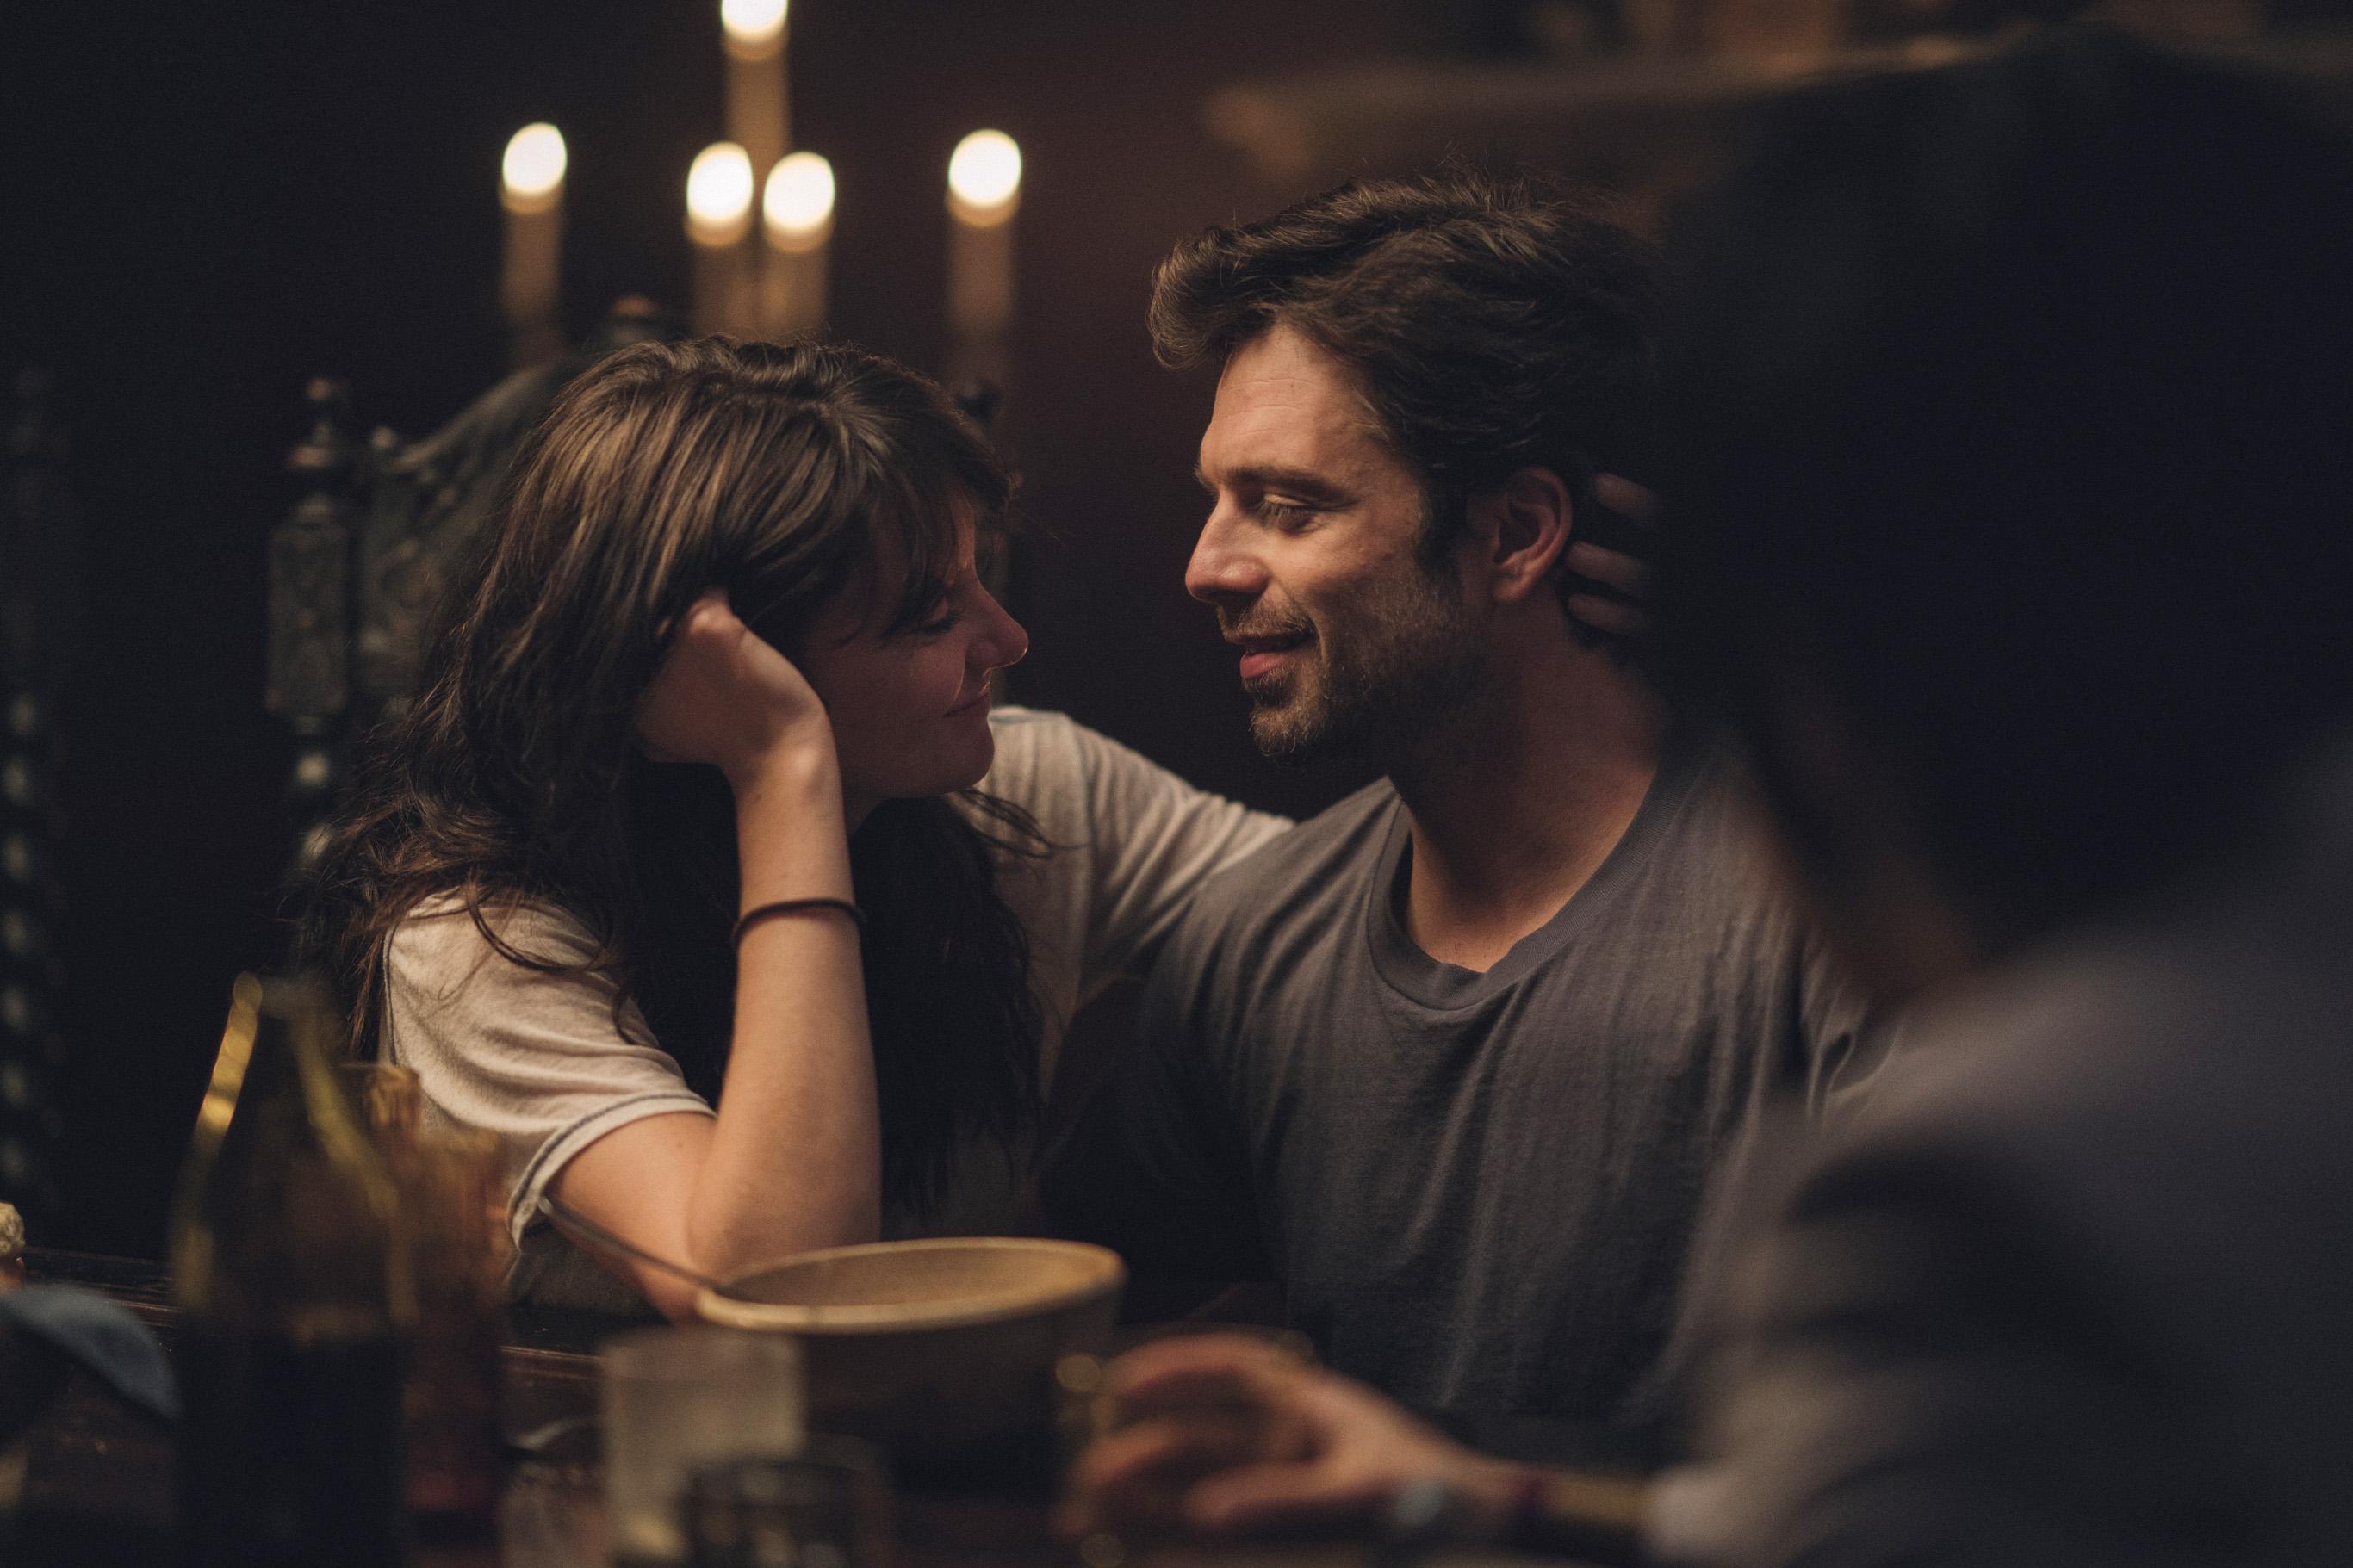 'Endings, Beginnings' Trailer: Shailene Woodley Is Caught in a Love Triangle in Drake Doremus' Drama